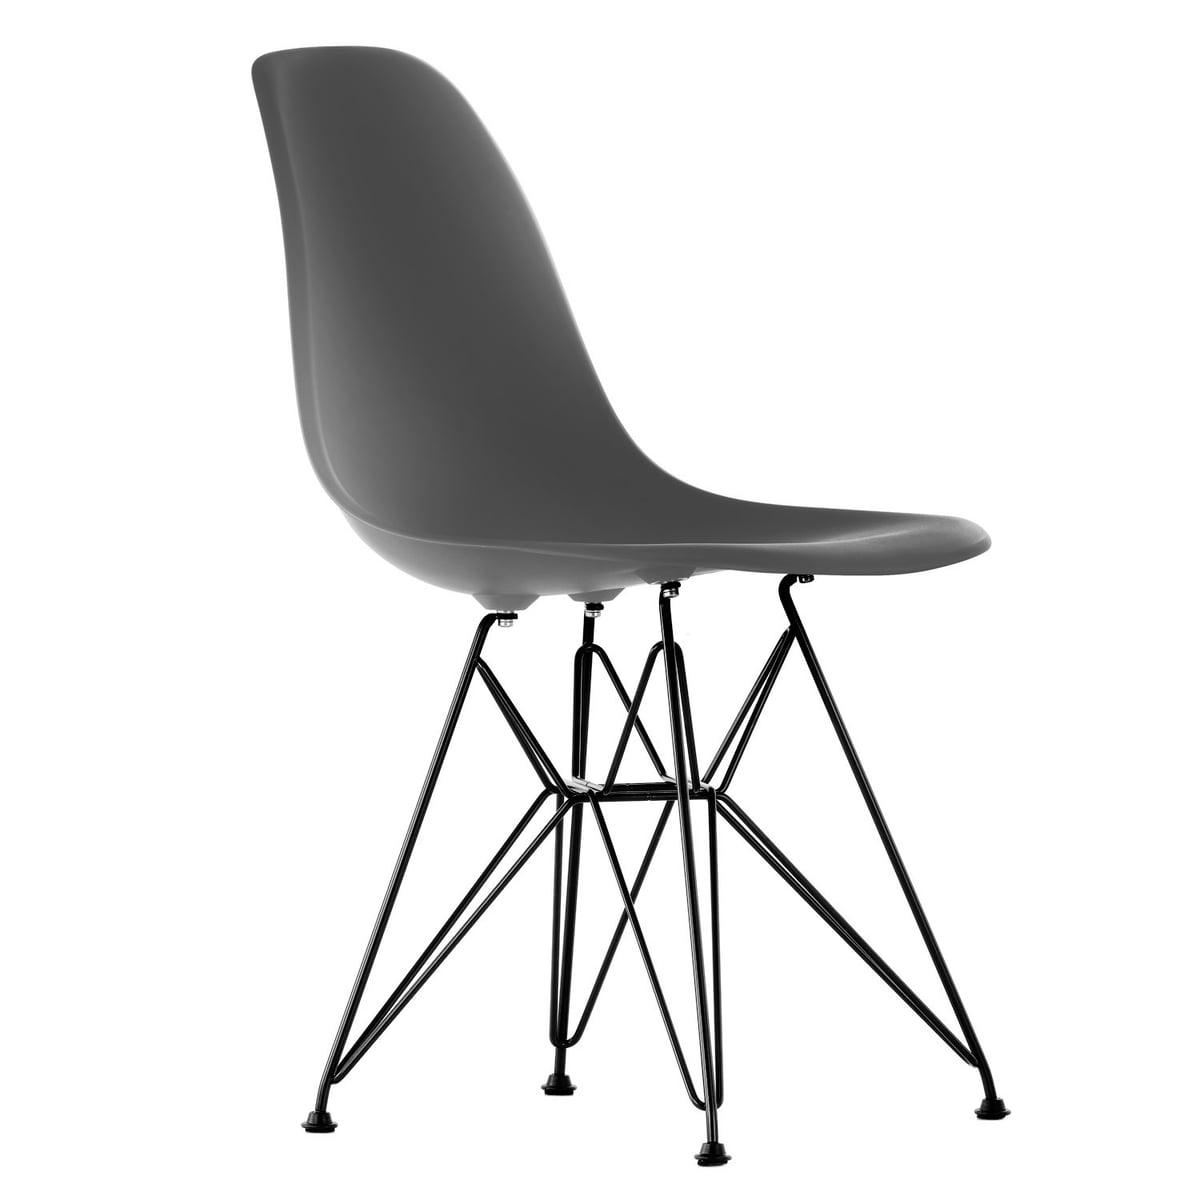 Vitra Eames Plastic Side Chair Dsr H 43 Cm Pulverbeschichtet